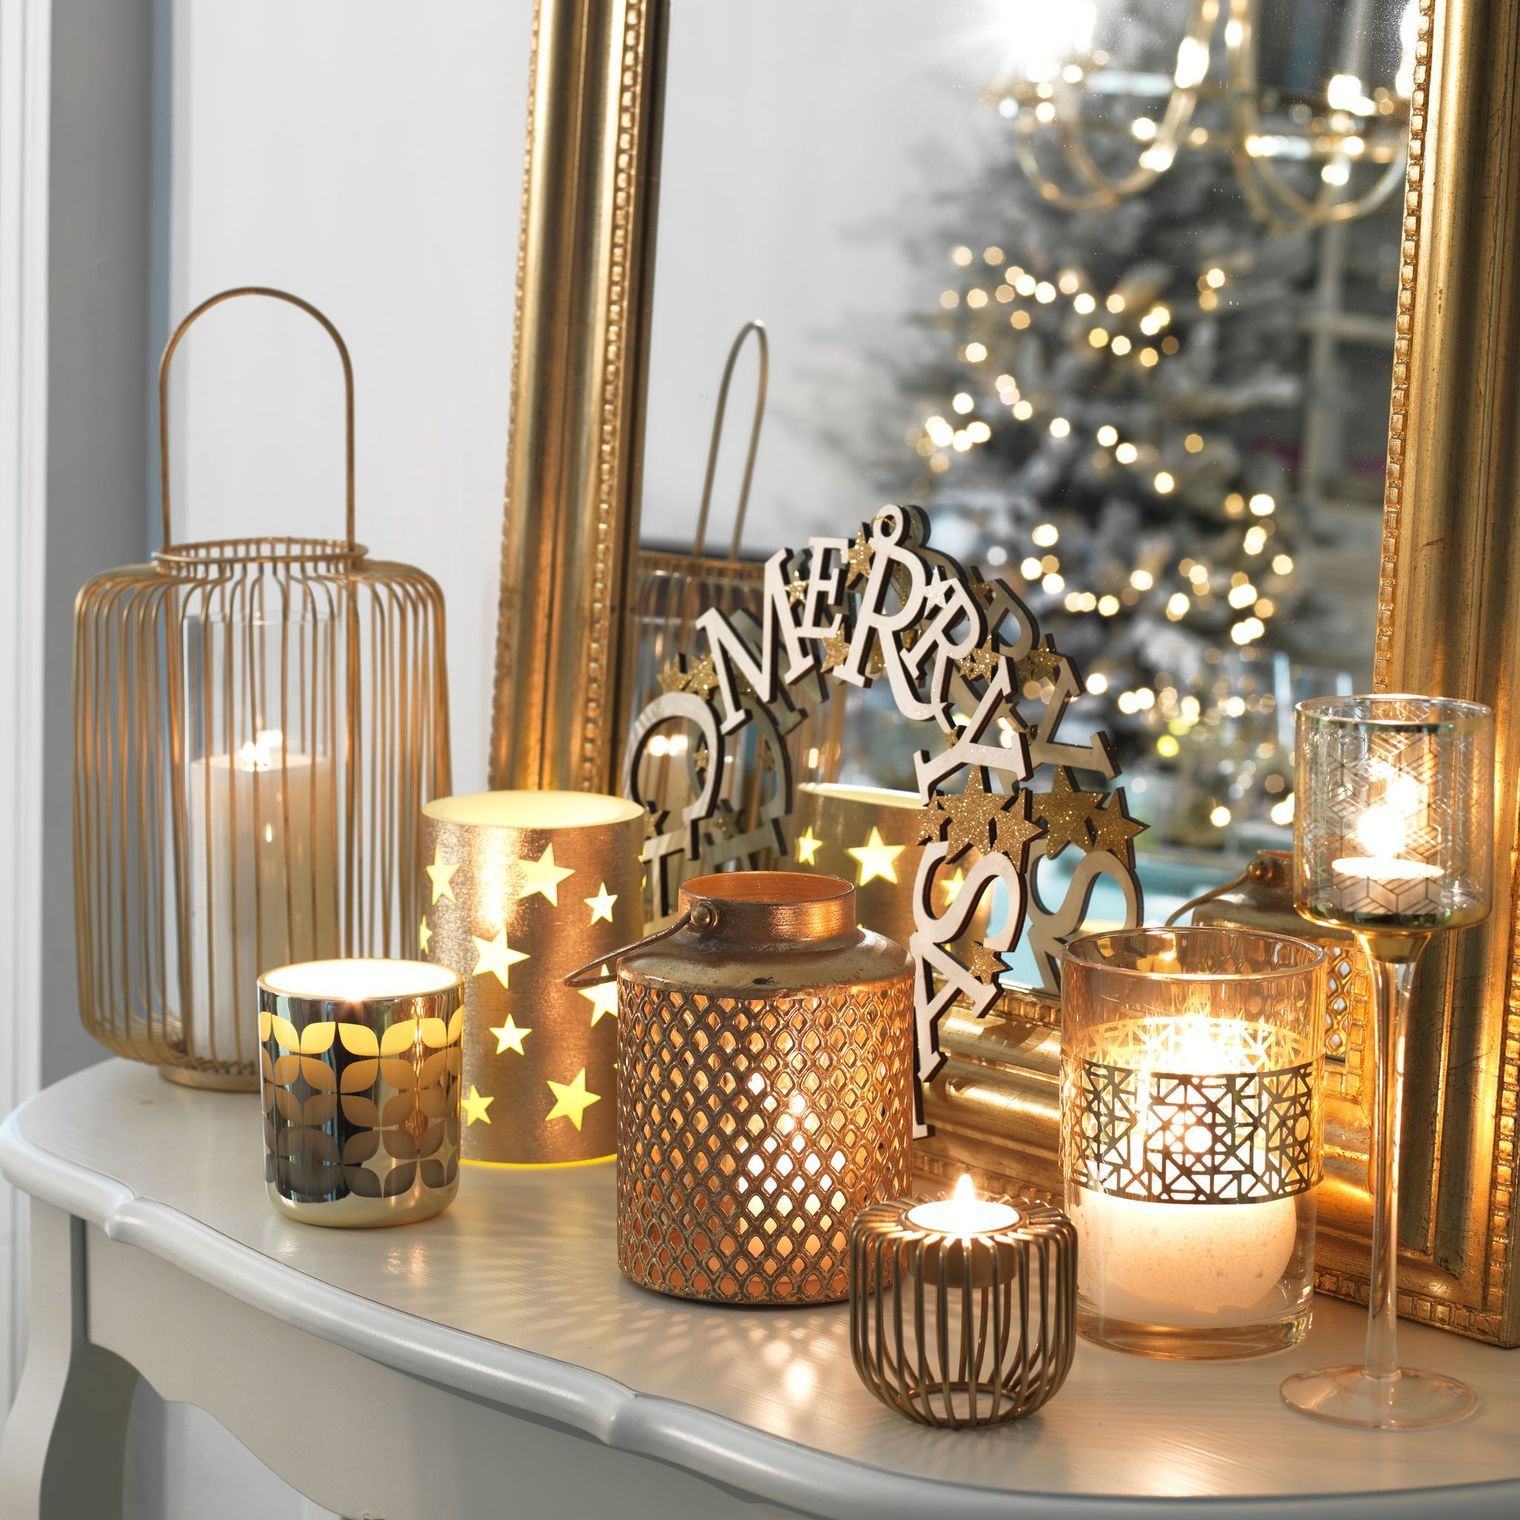 Deco Noel Bougeoirs Photophores Et Lanternes French Christmas Decor Christmas Interiors